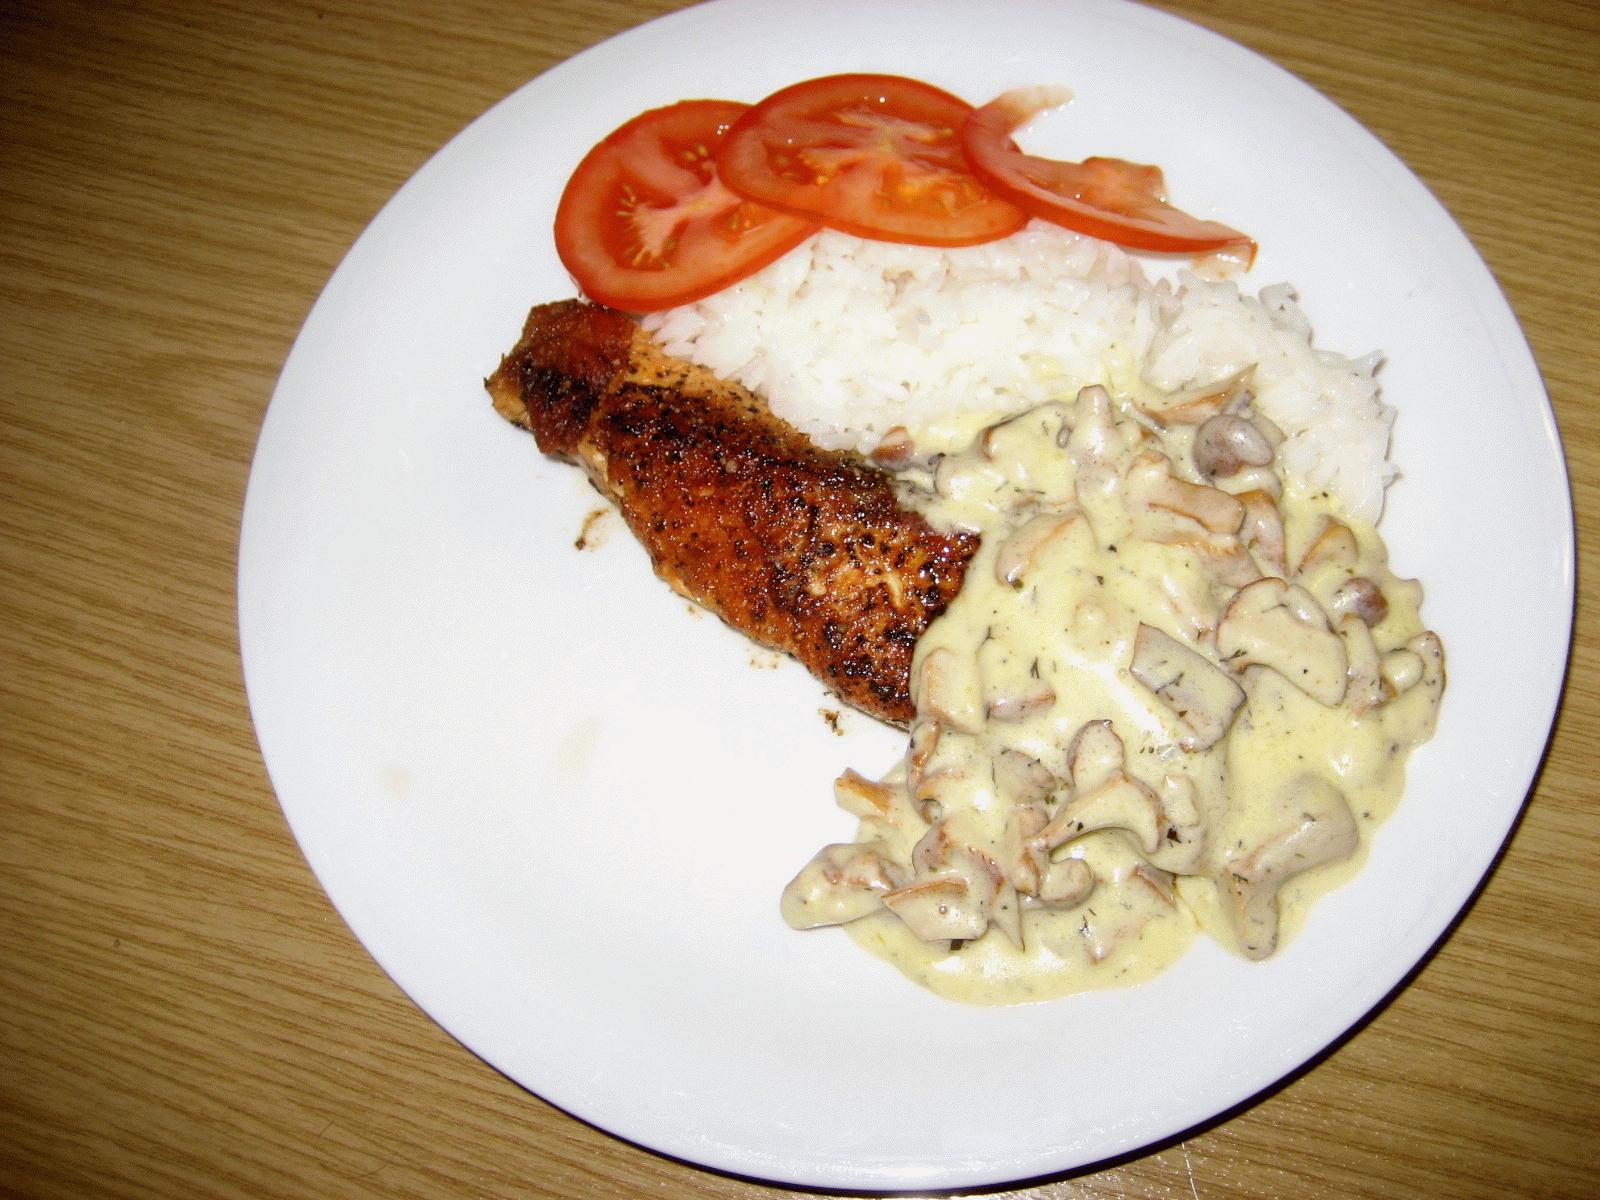 Stekt lax med kantarellsås - A`la crème fraiche